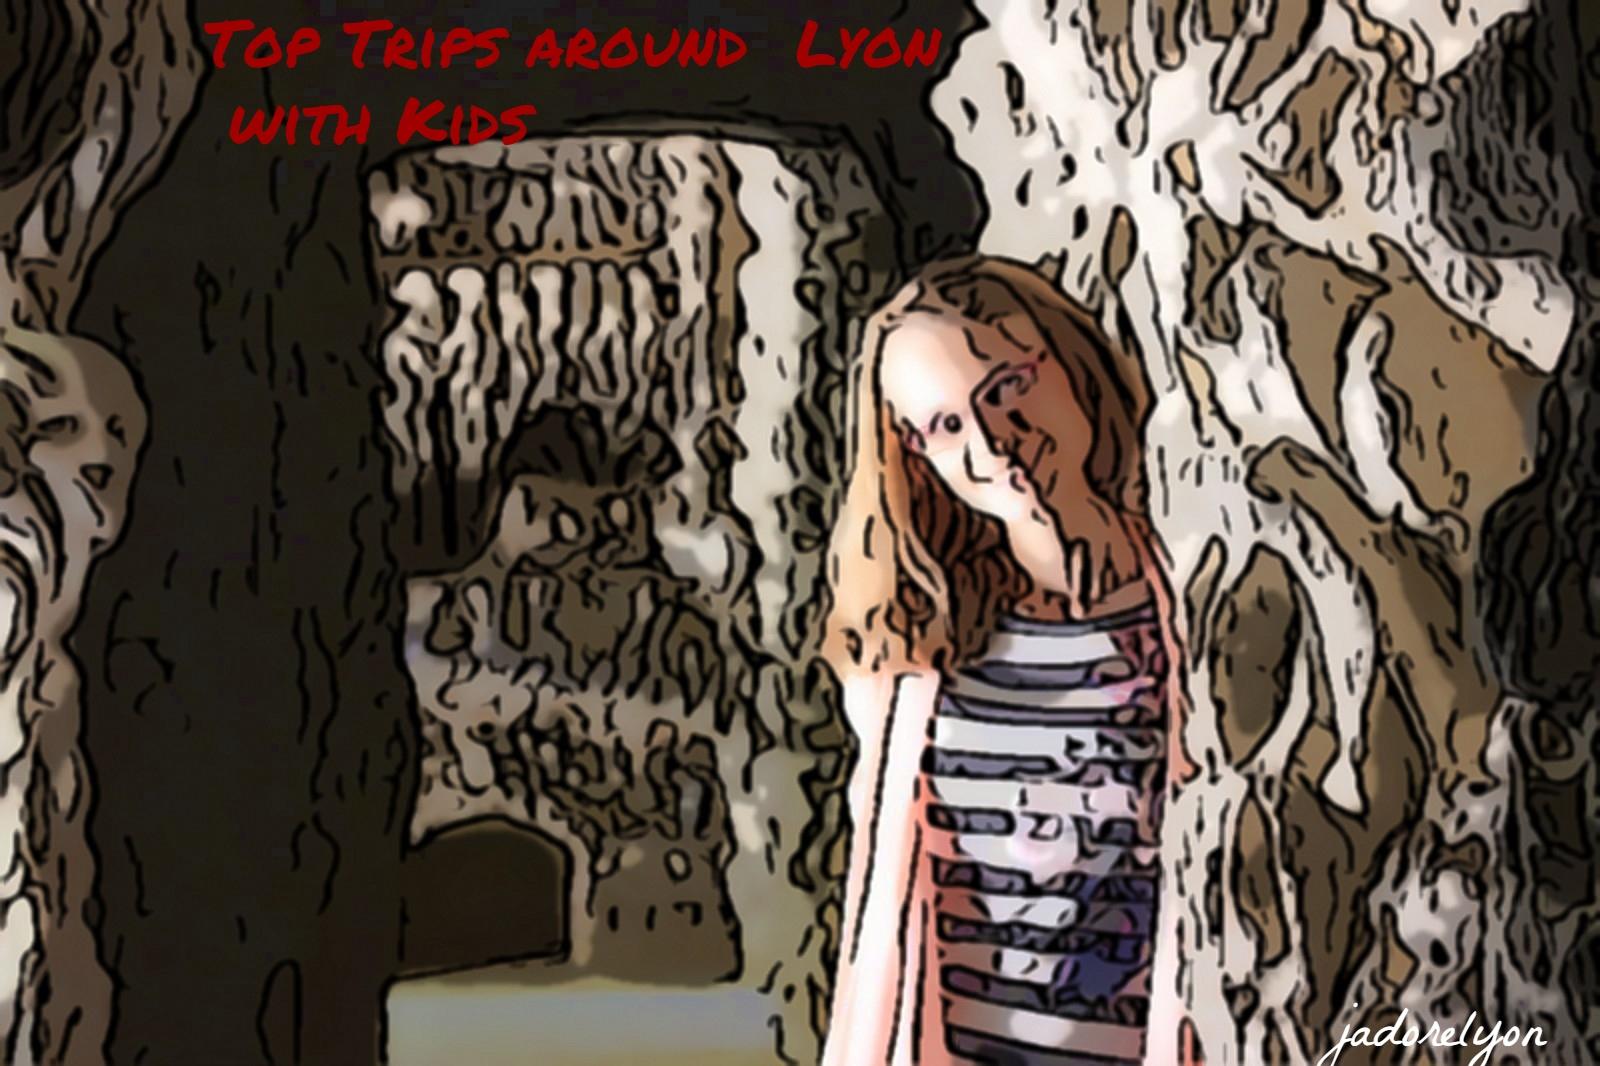 Trips around Lyon with kids 1